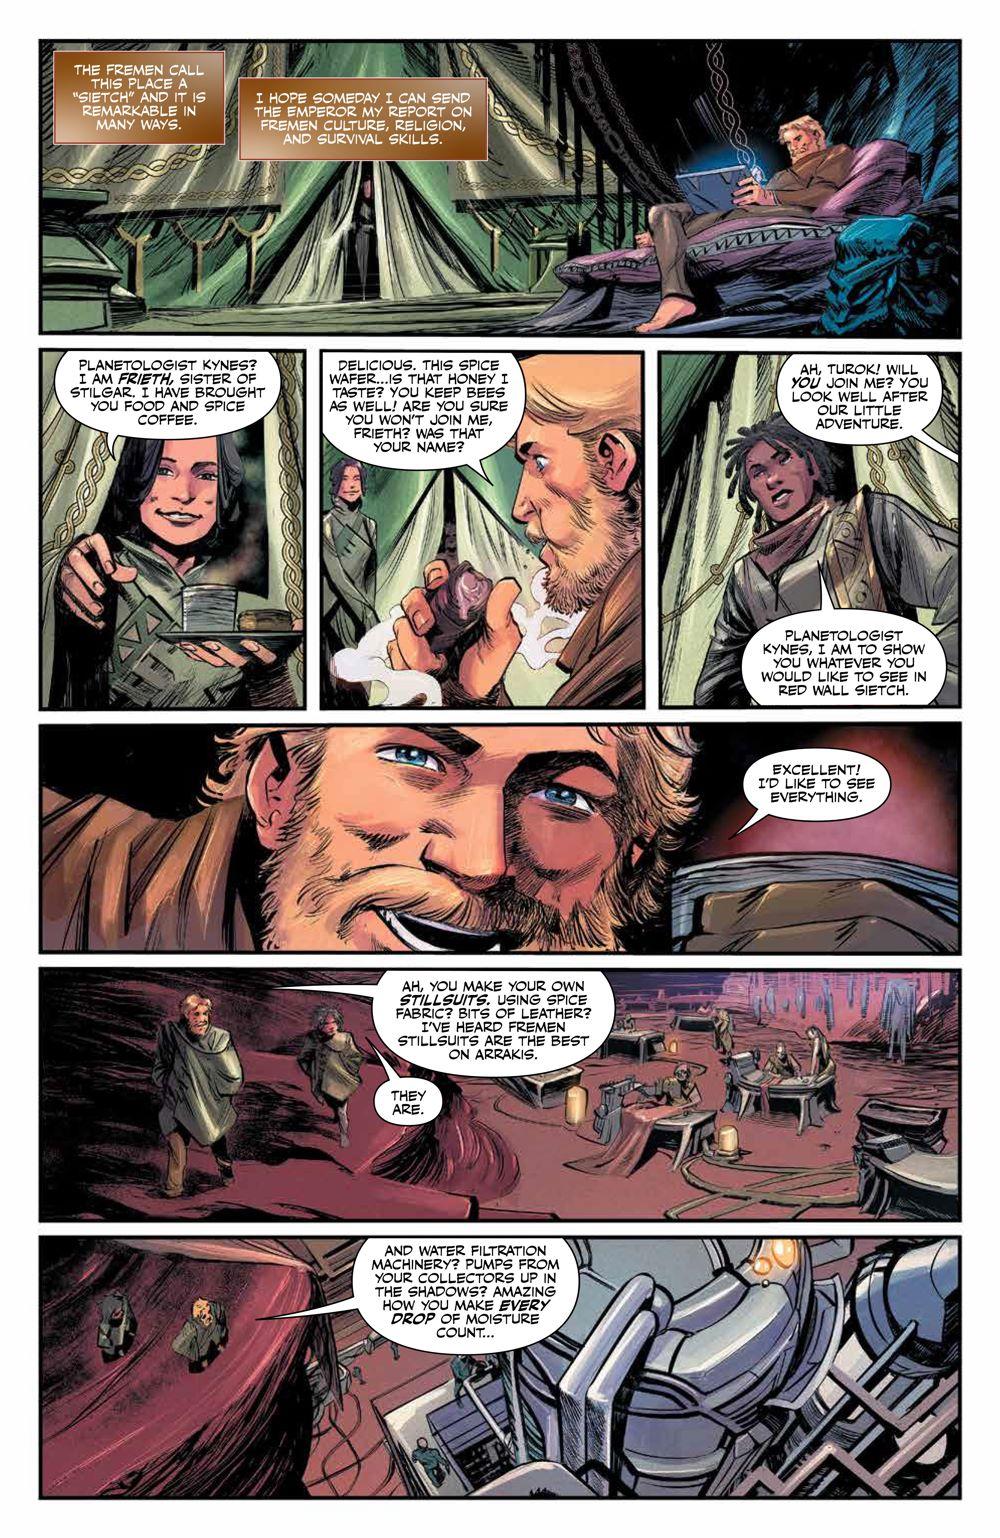 Dune_HouseAtreides_005_PRESS_5 ComicList Previews: DUNE HOUSE ATREIDES #5 (OF 12)